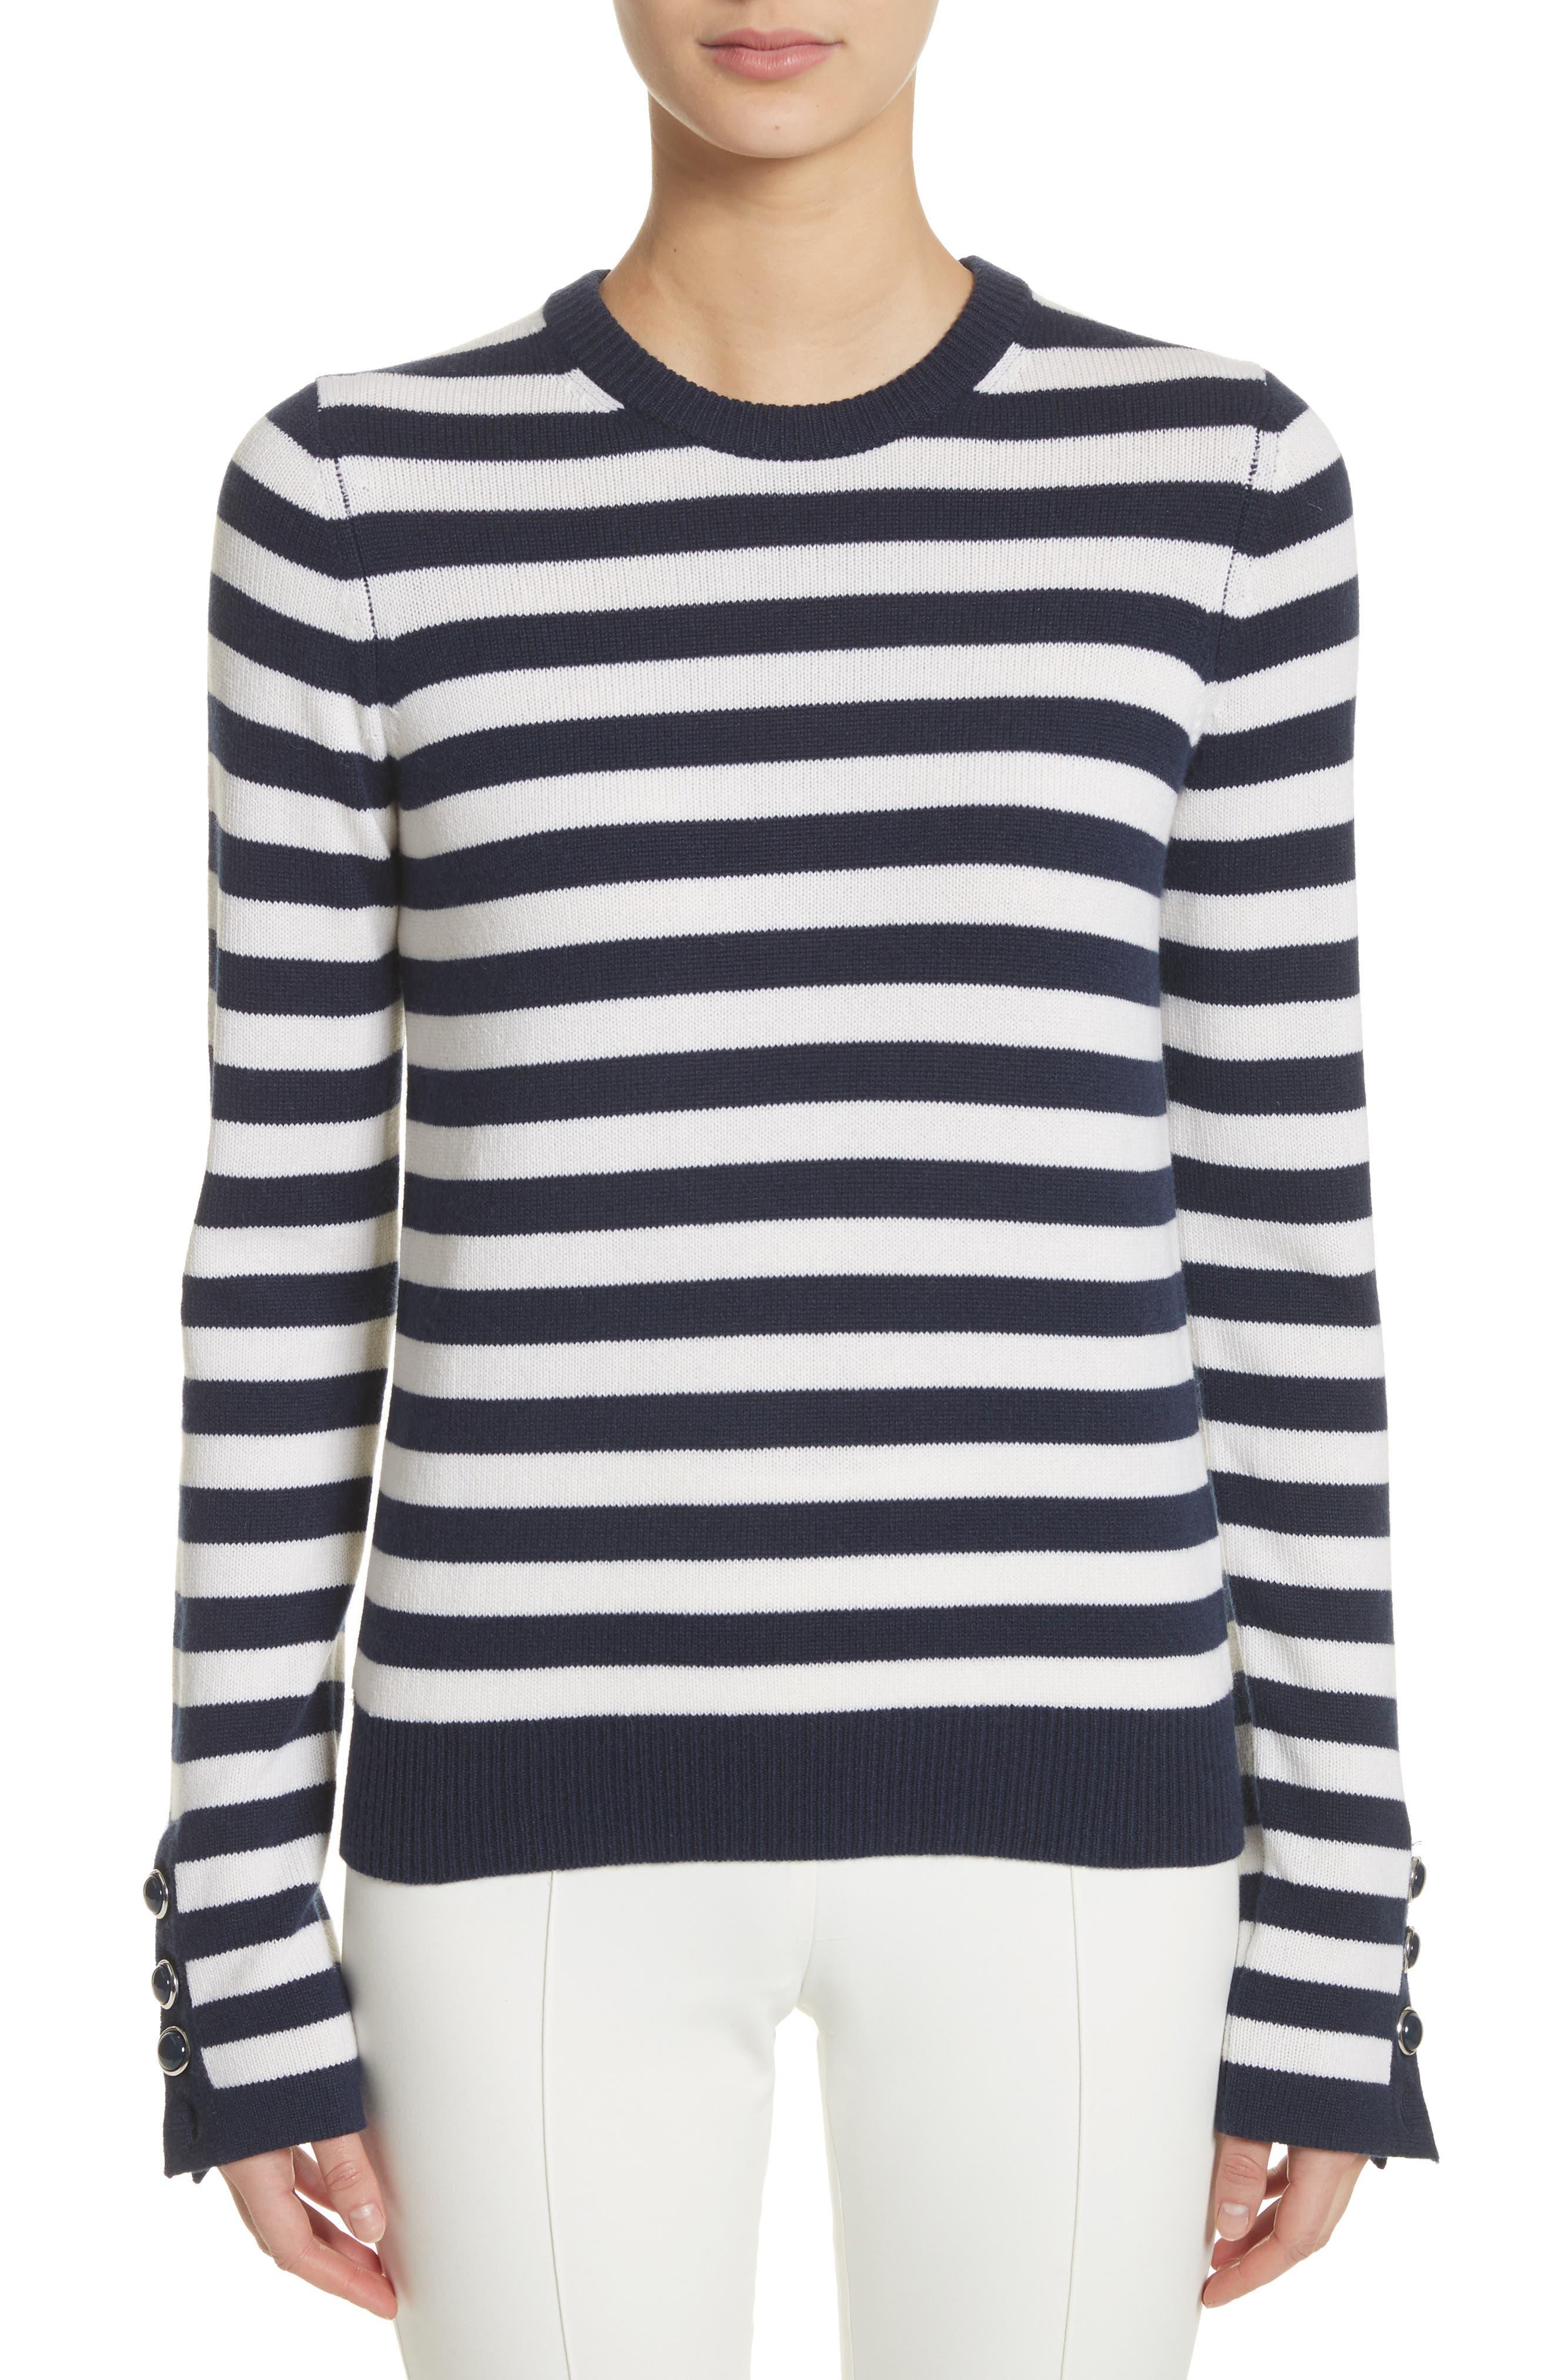 Main Image - Michael Kors Button Cuff Cashmere Sweater